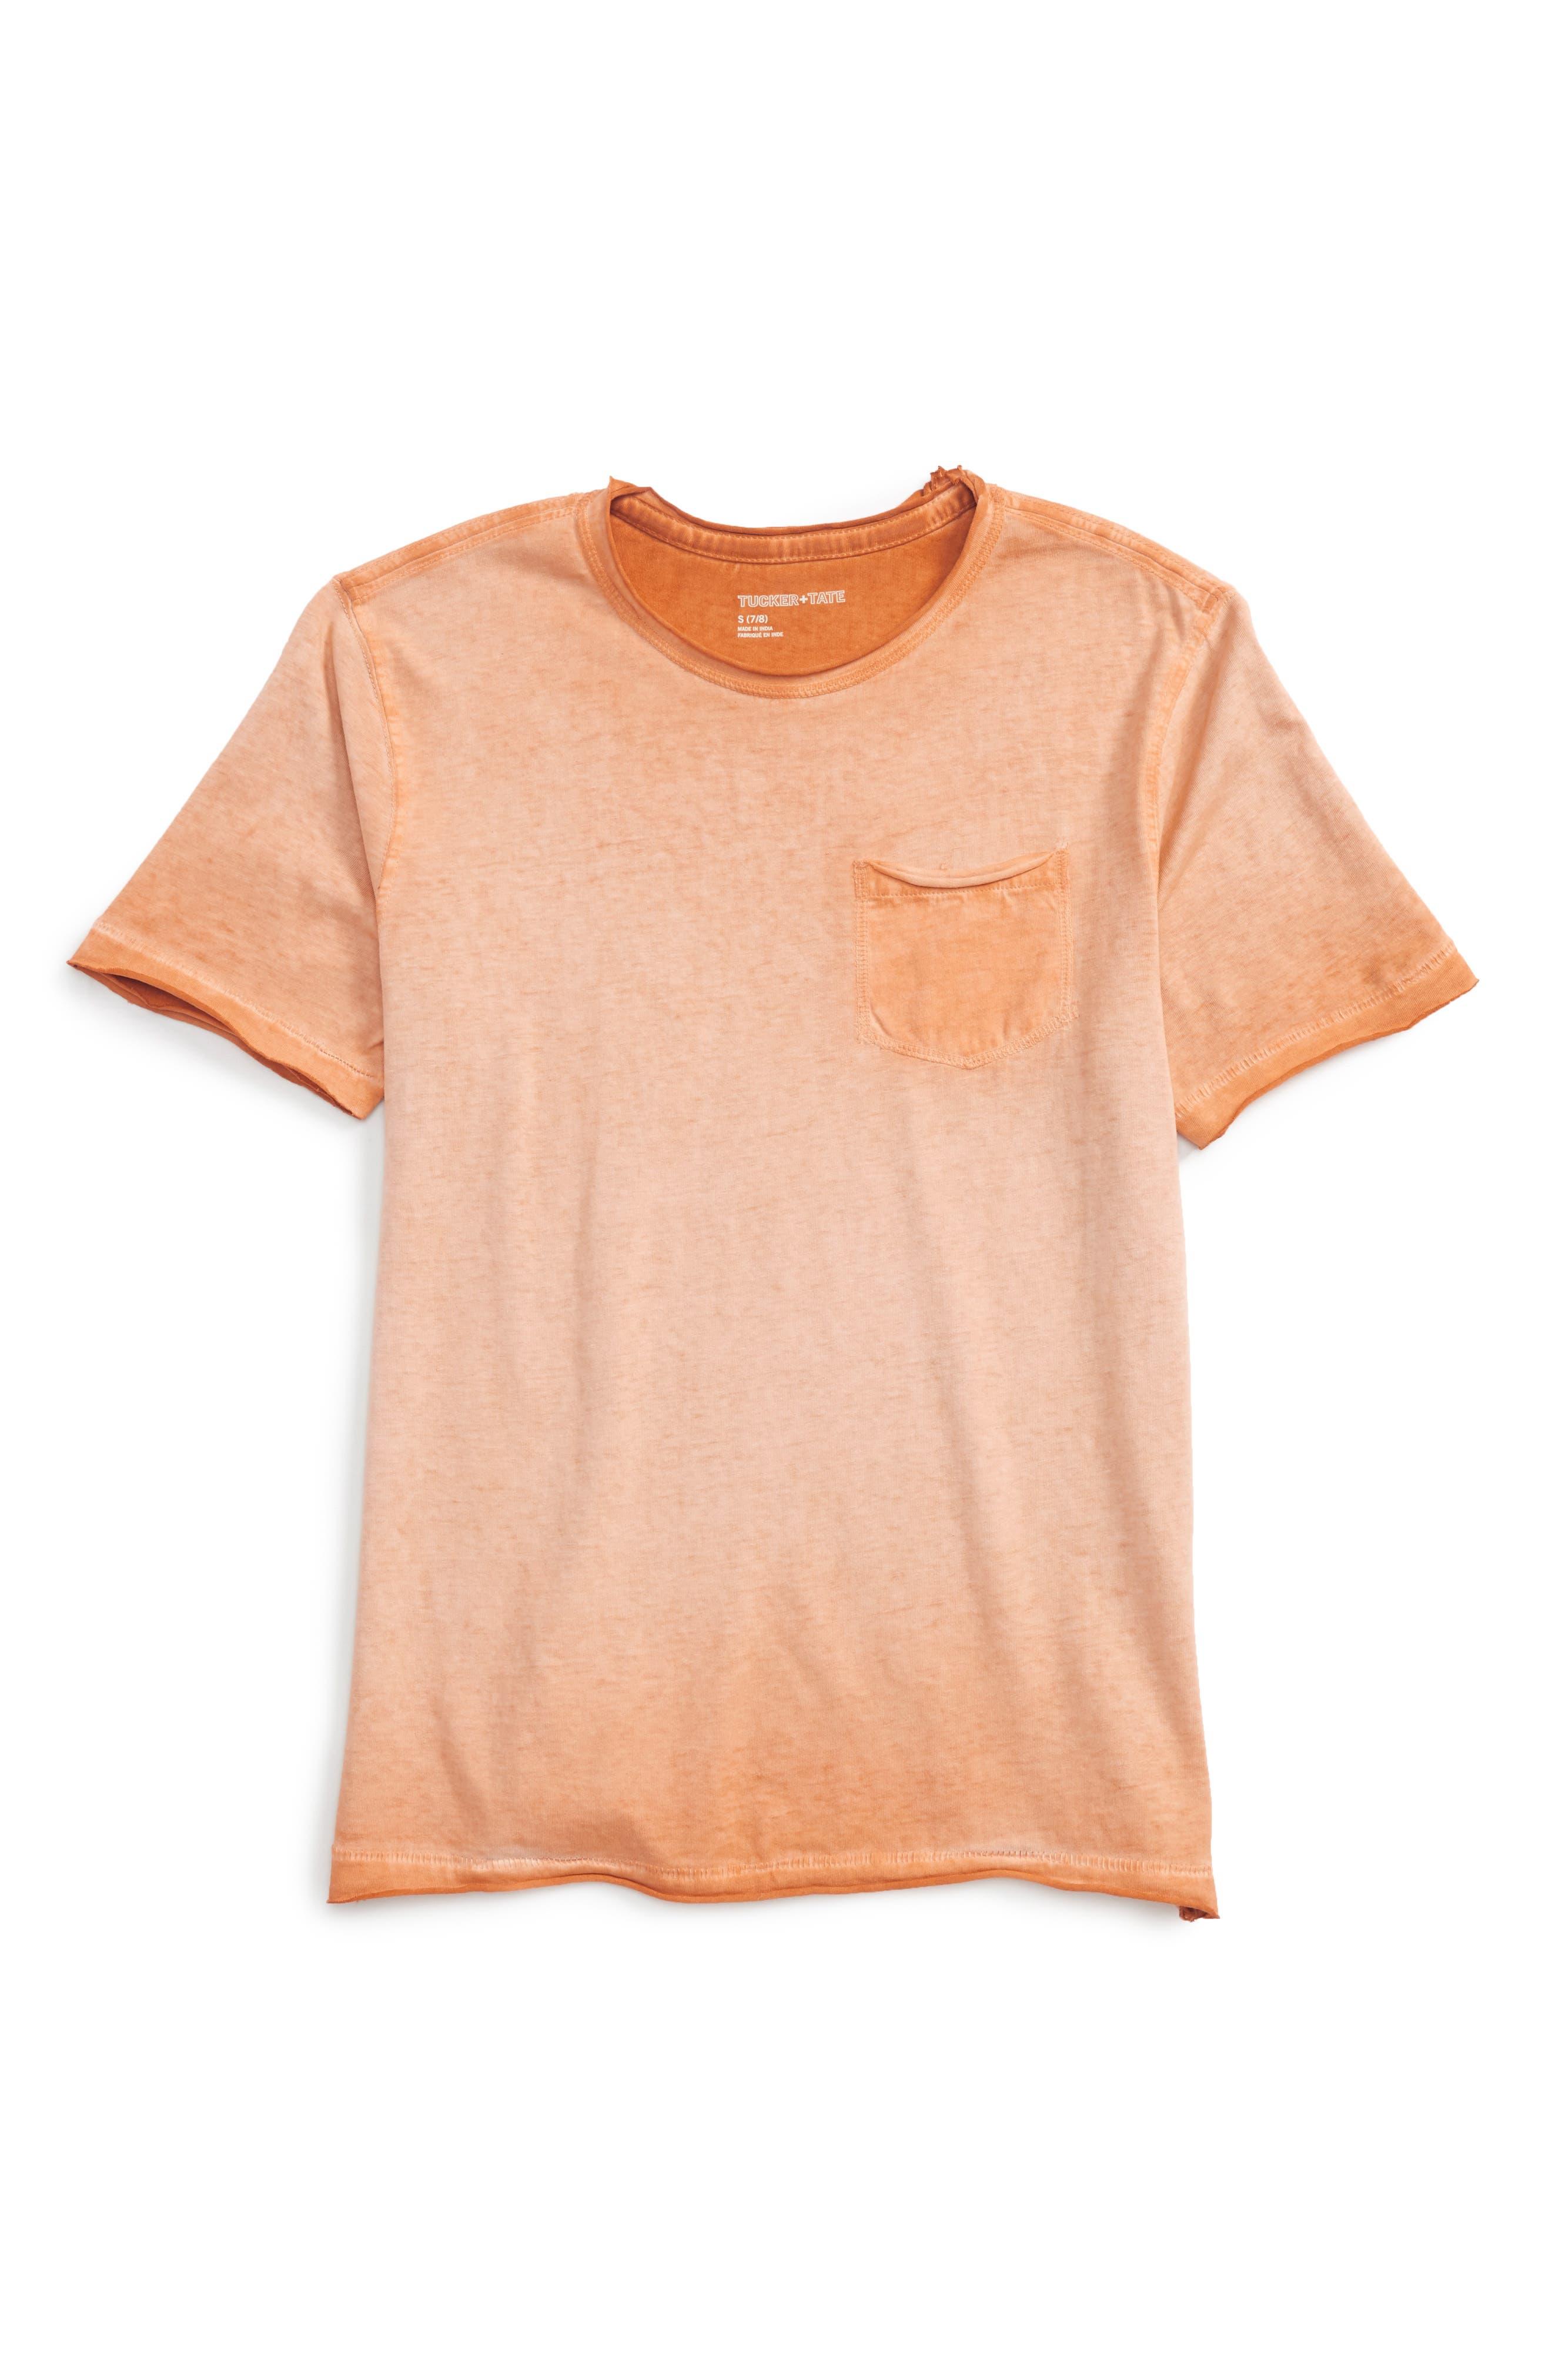 TUCKER + TATE Easy Pocket T-Shirt